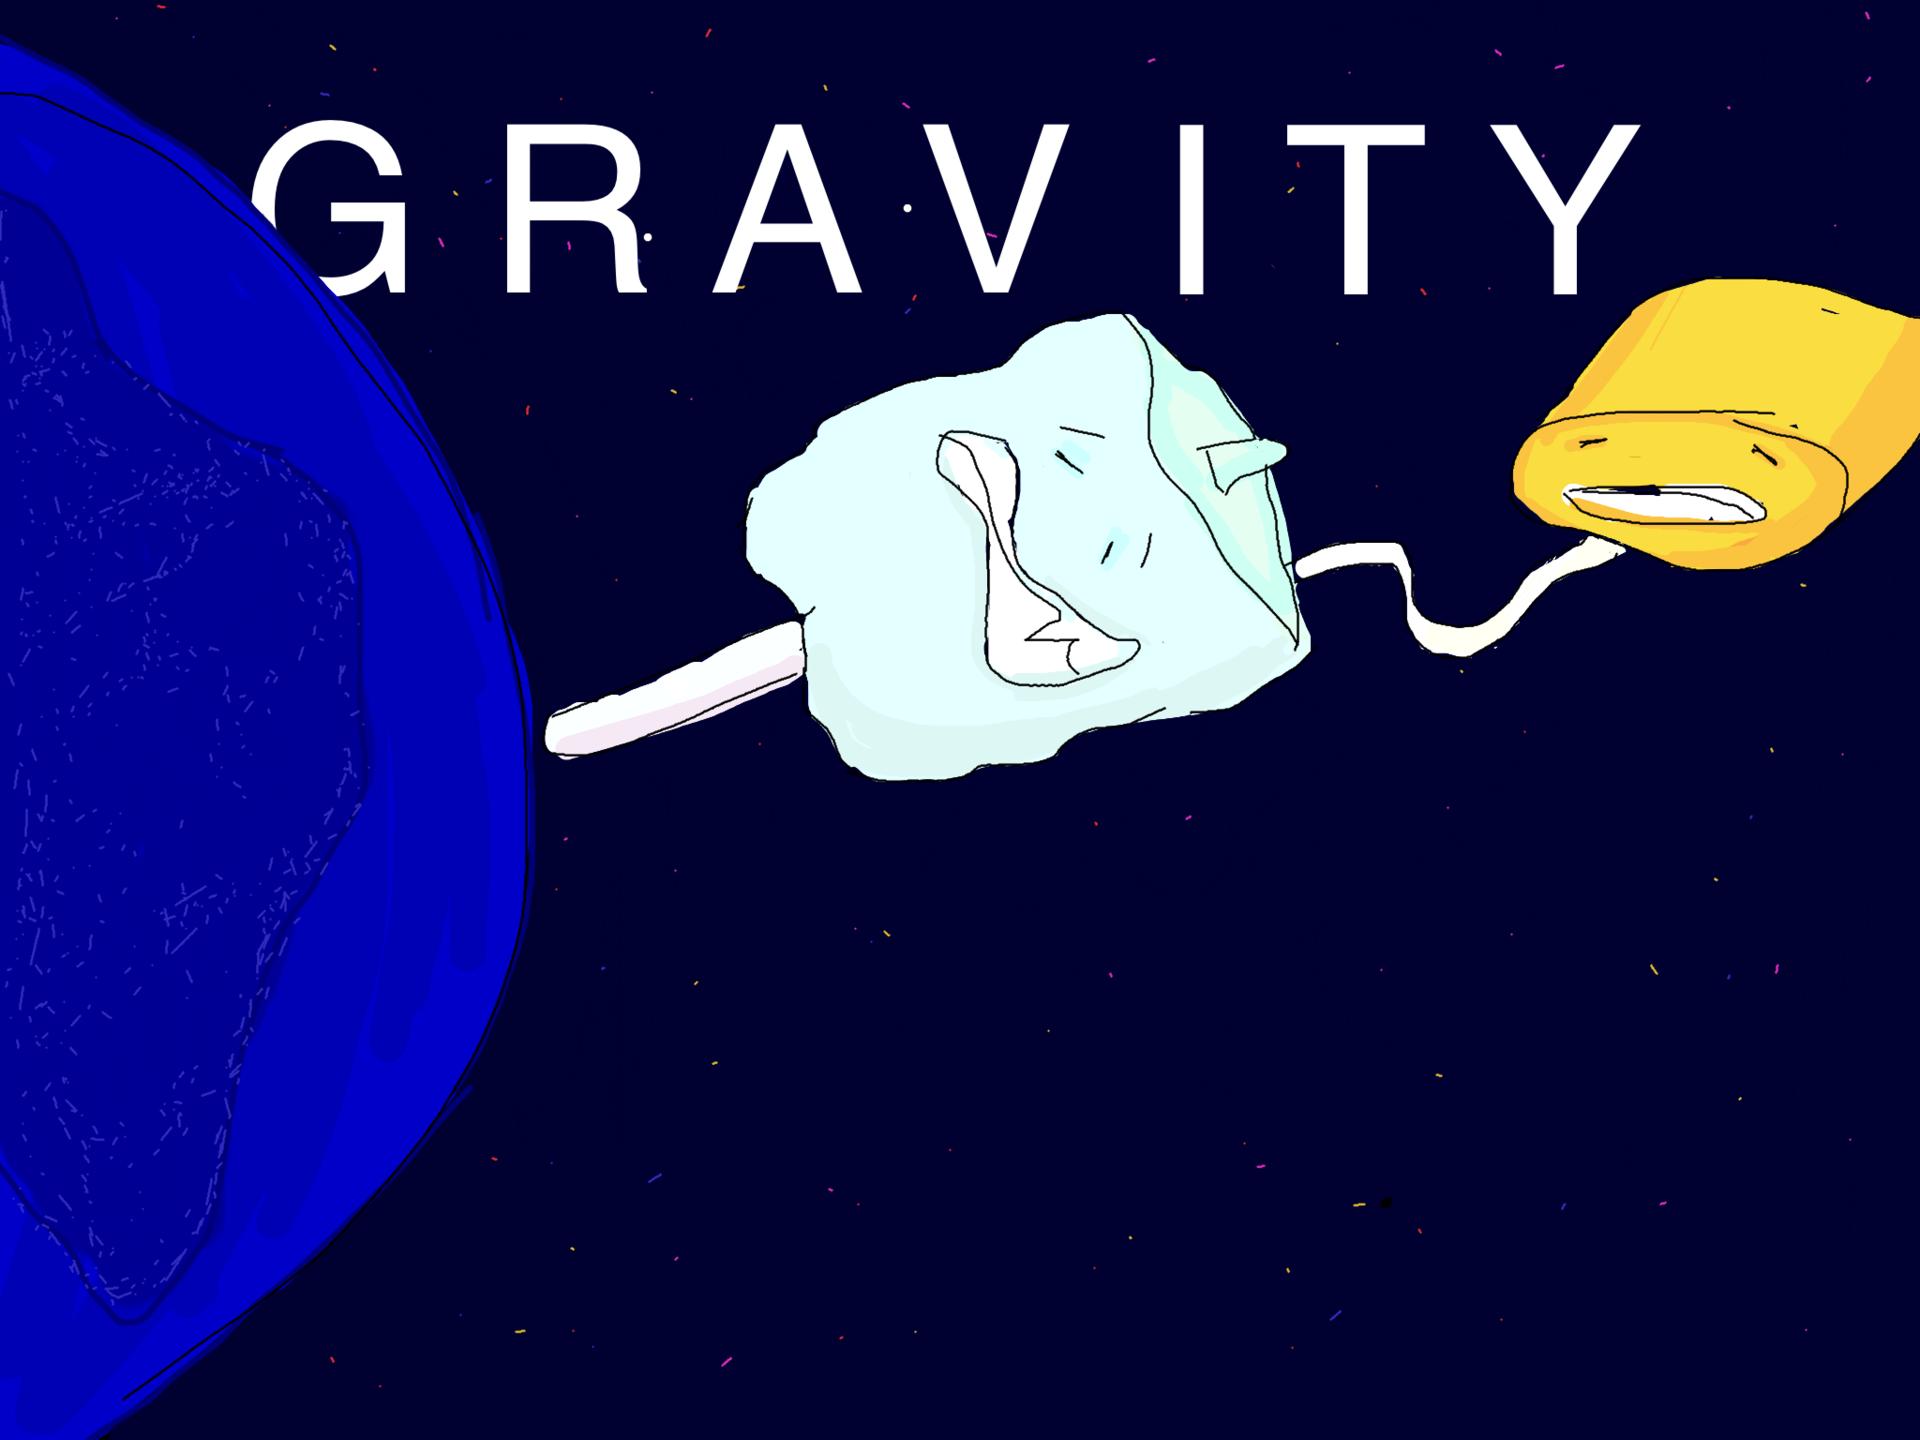 Gravity_Global_Game_Jam_Minsk_2015